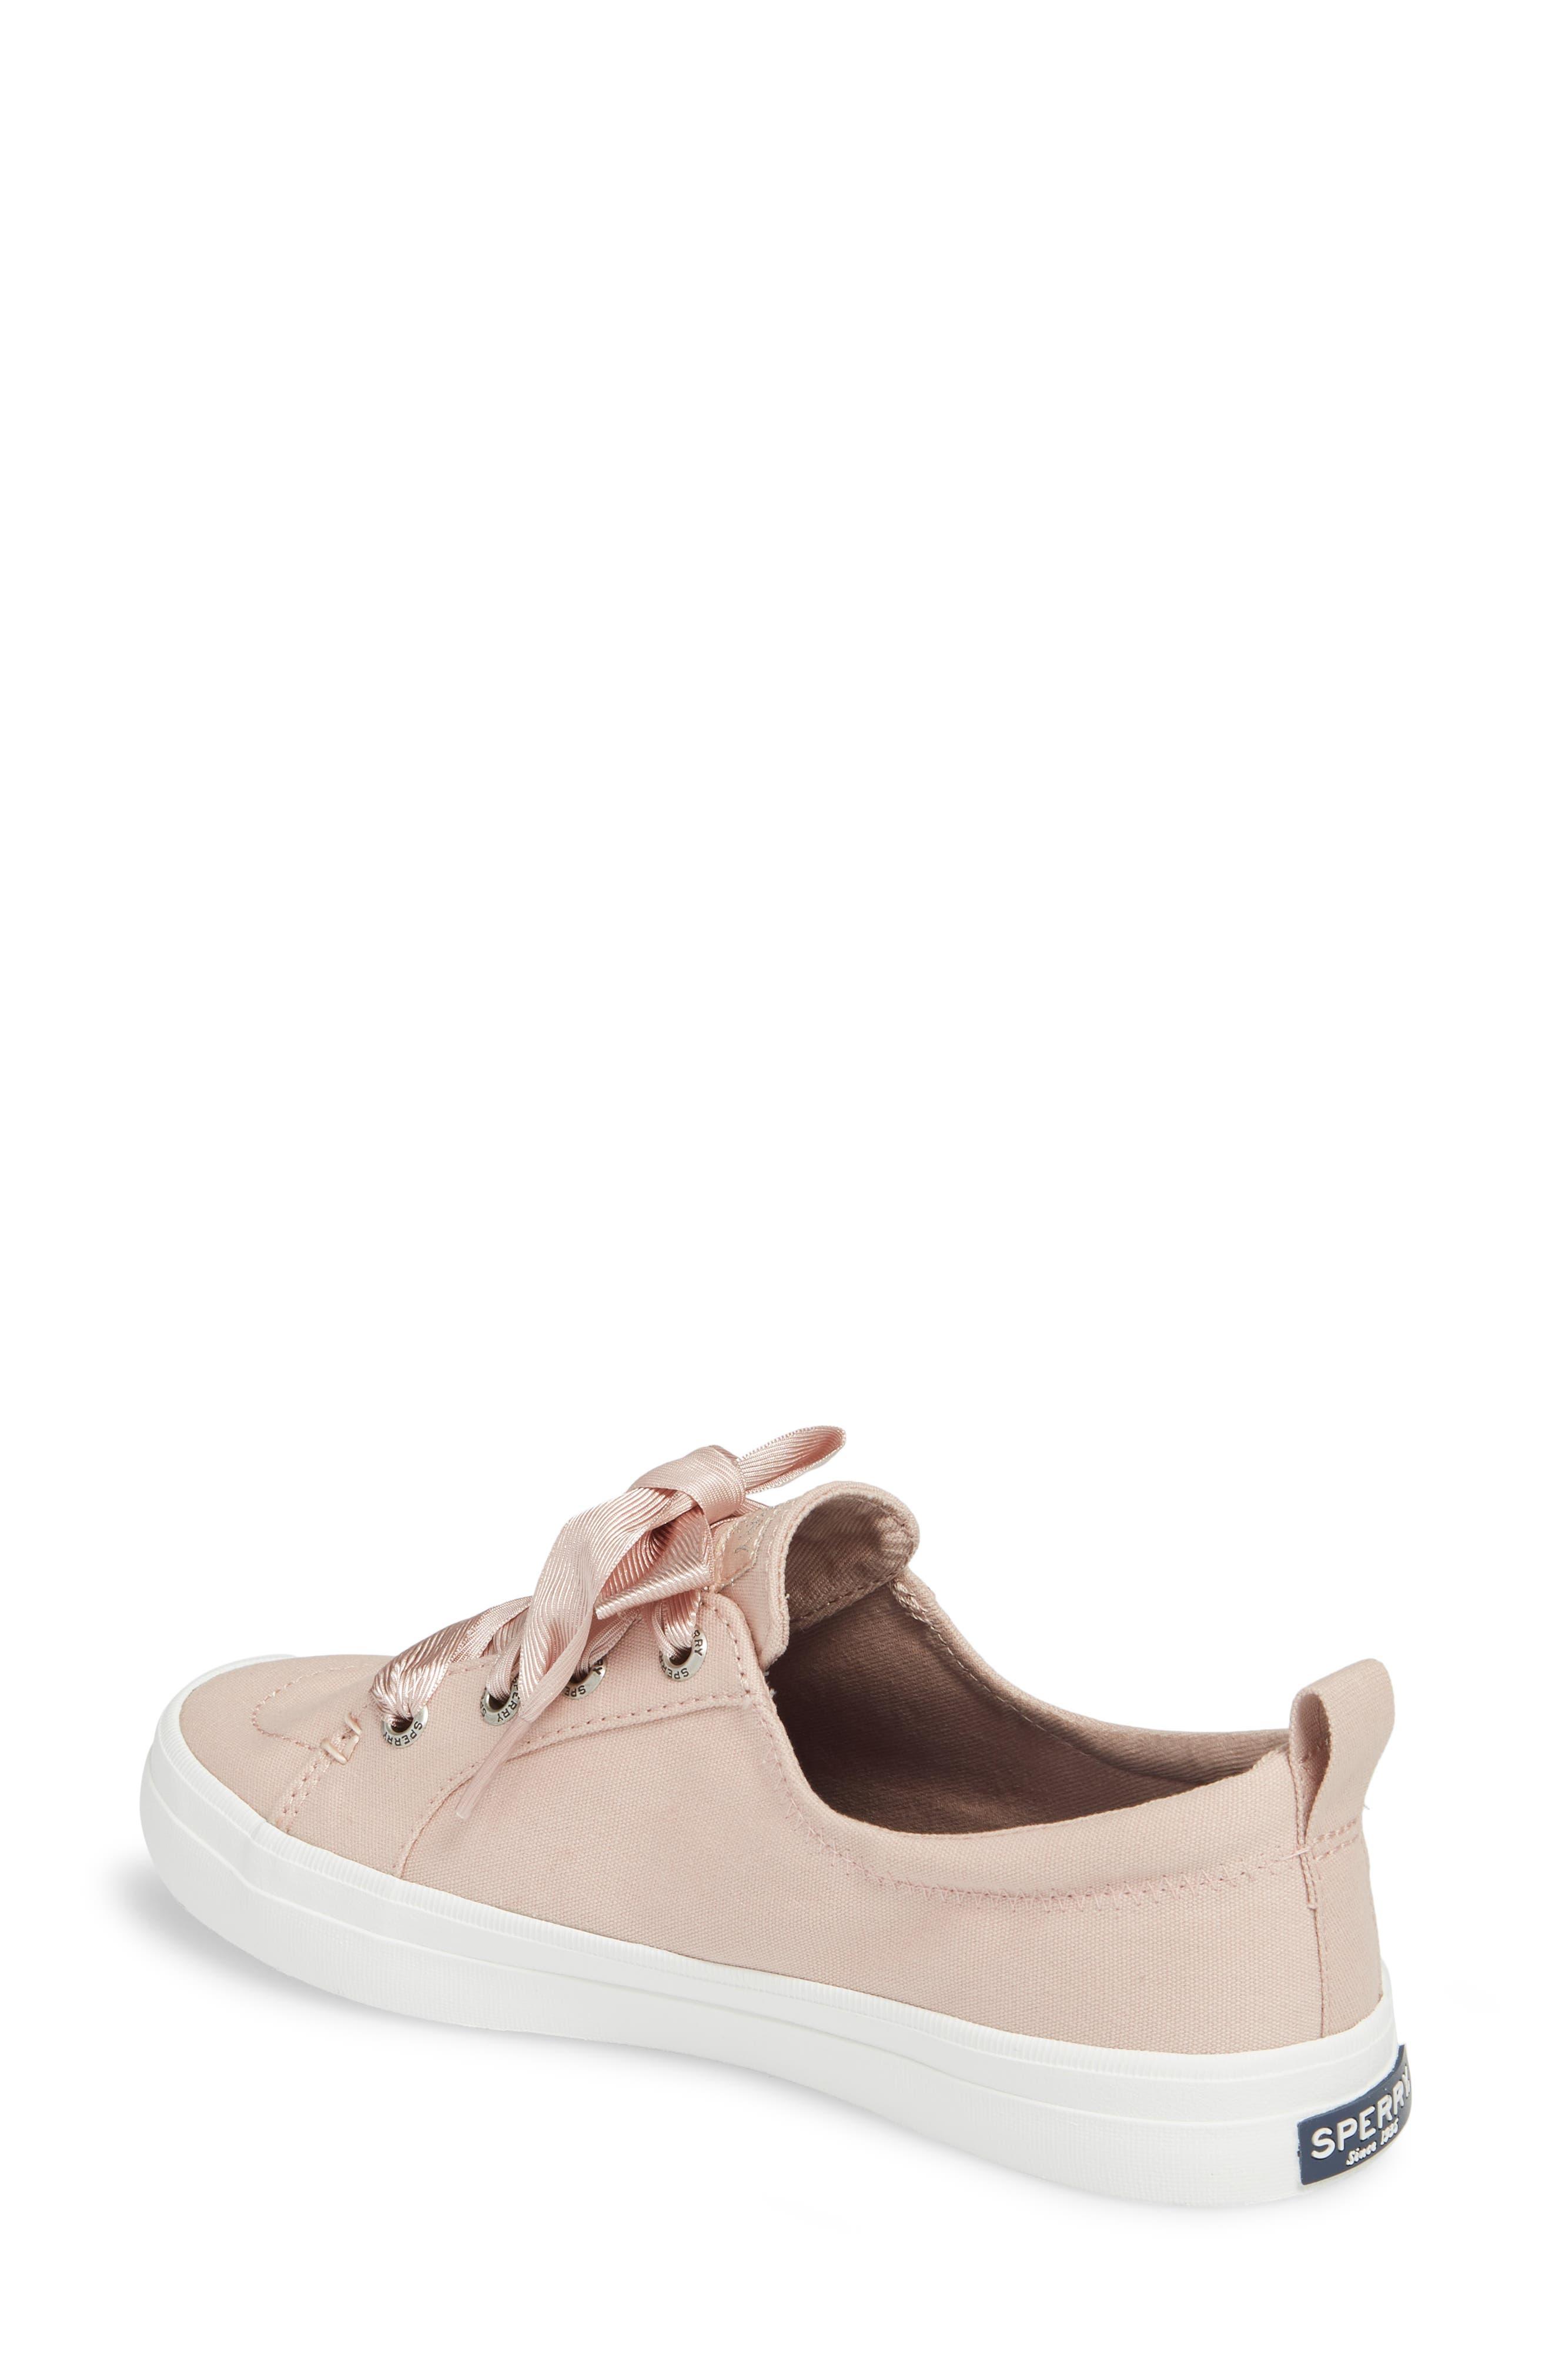 Crest Vibe Satin Lace Sneaker,                             Alternate thumbnail 6, color,